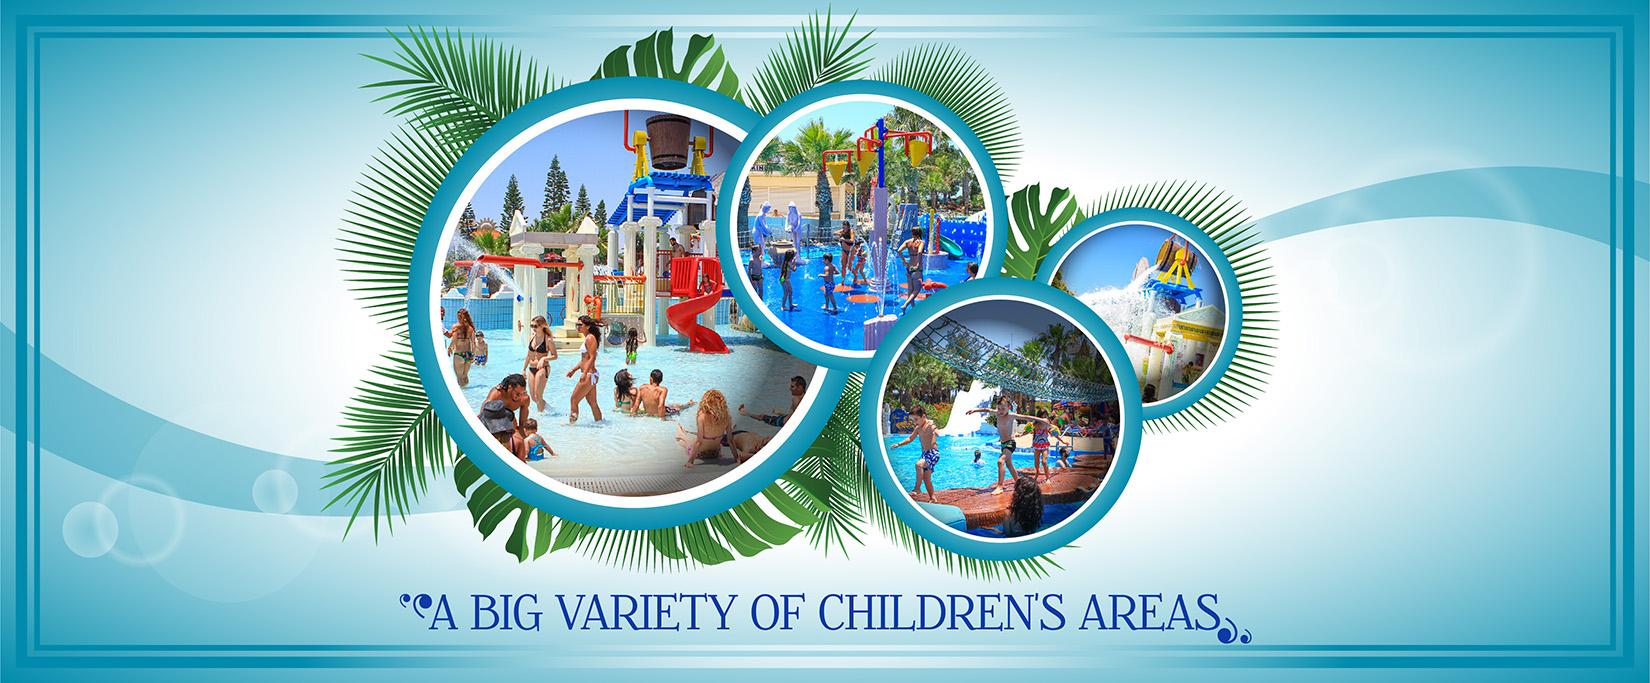 WaterWorld Themed Waterpark Ayia Napa.